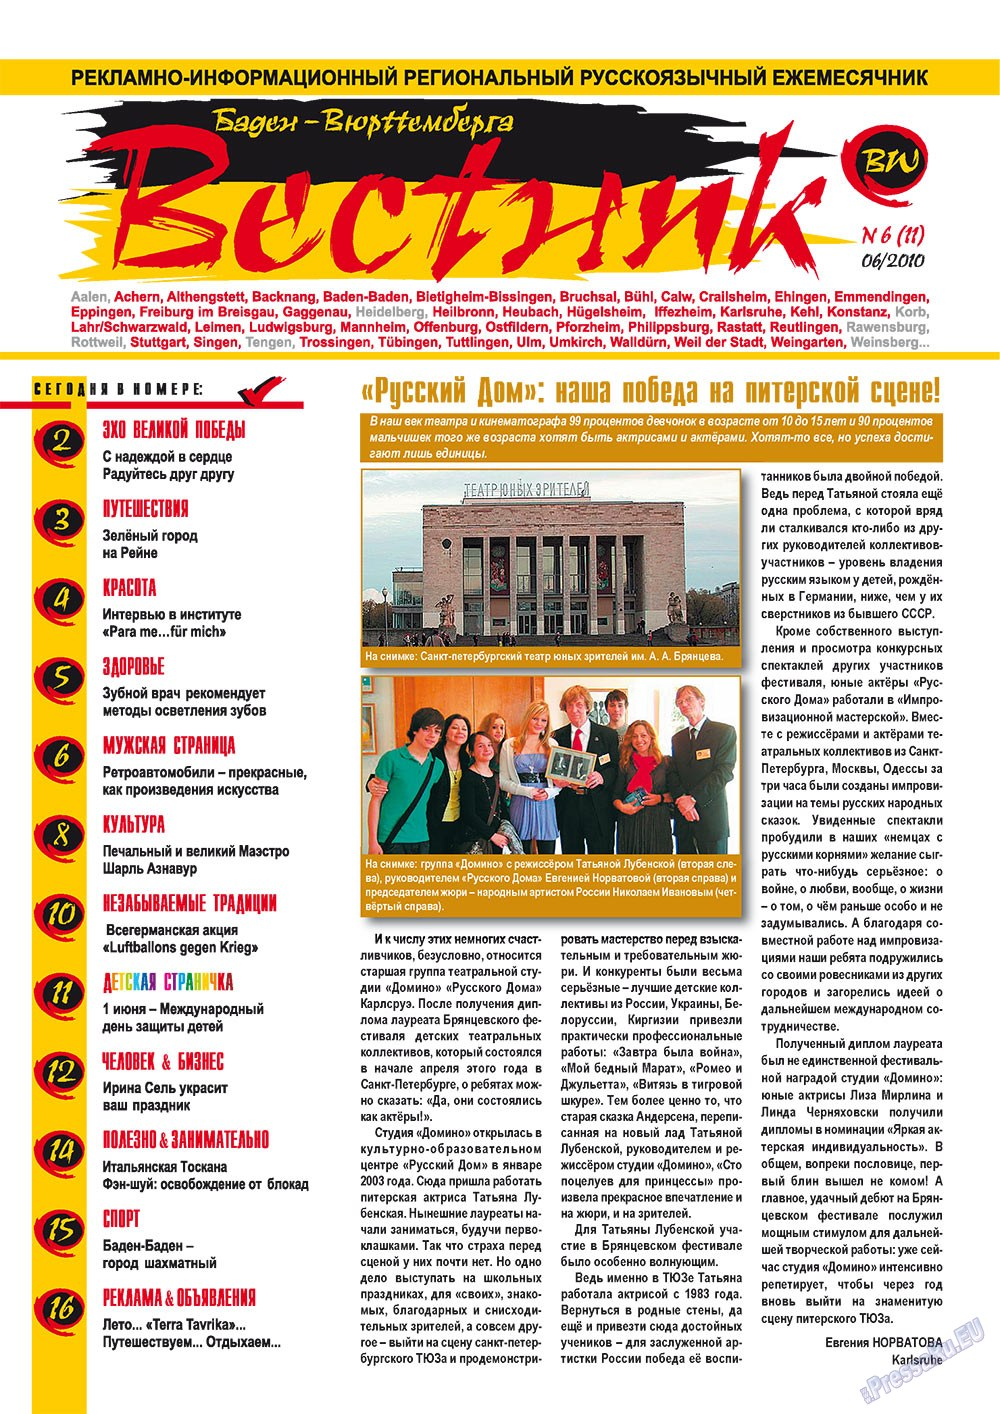 Вестник-info (журнал). 2010 год, номер 6, стр. 1